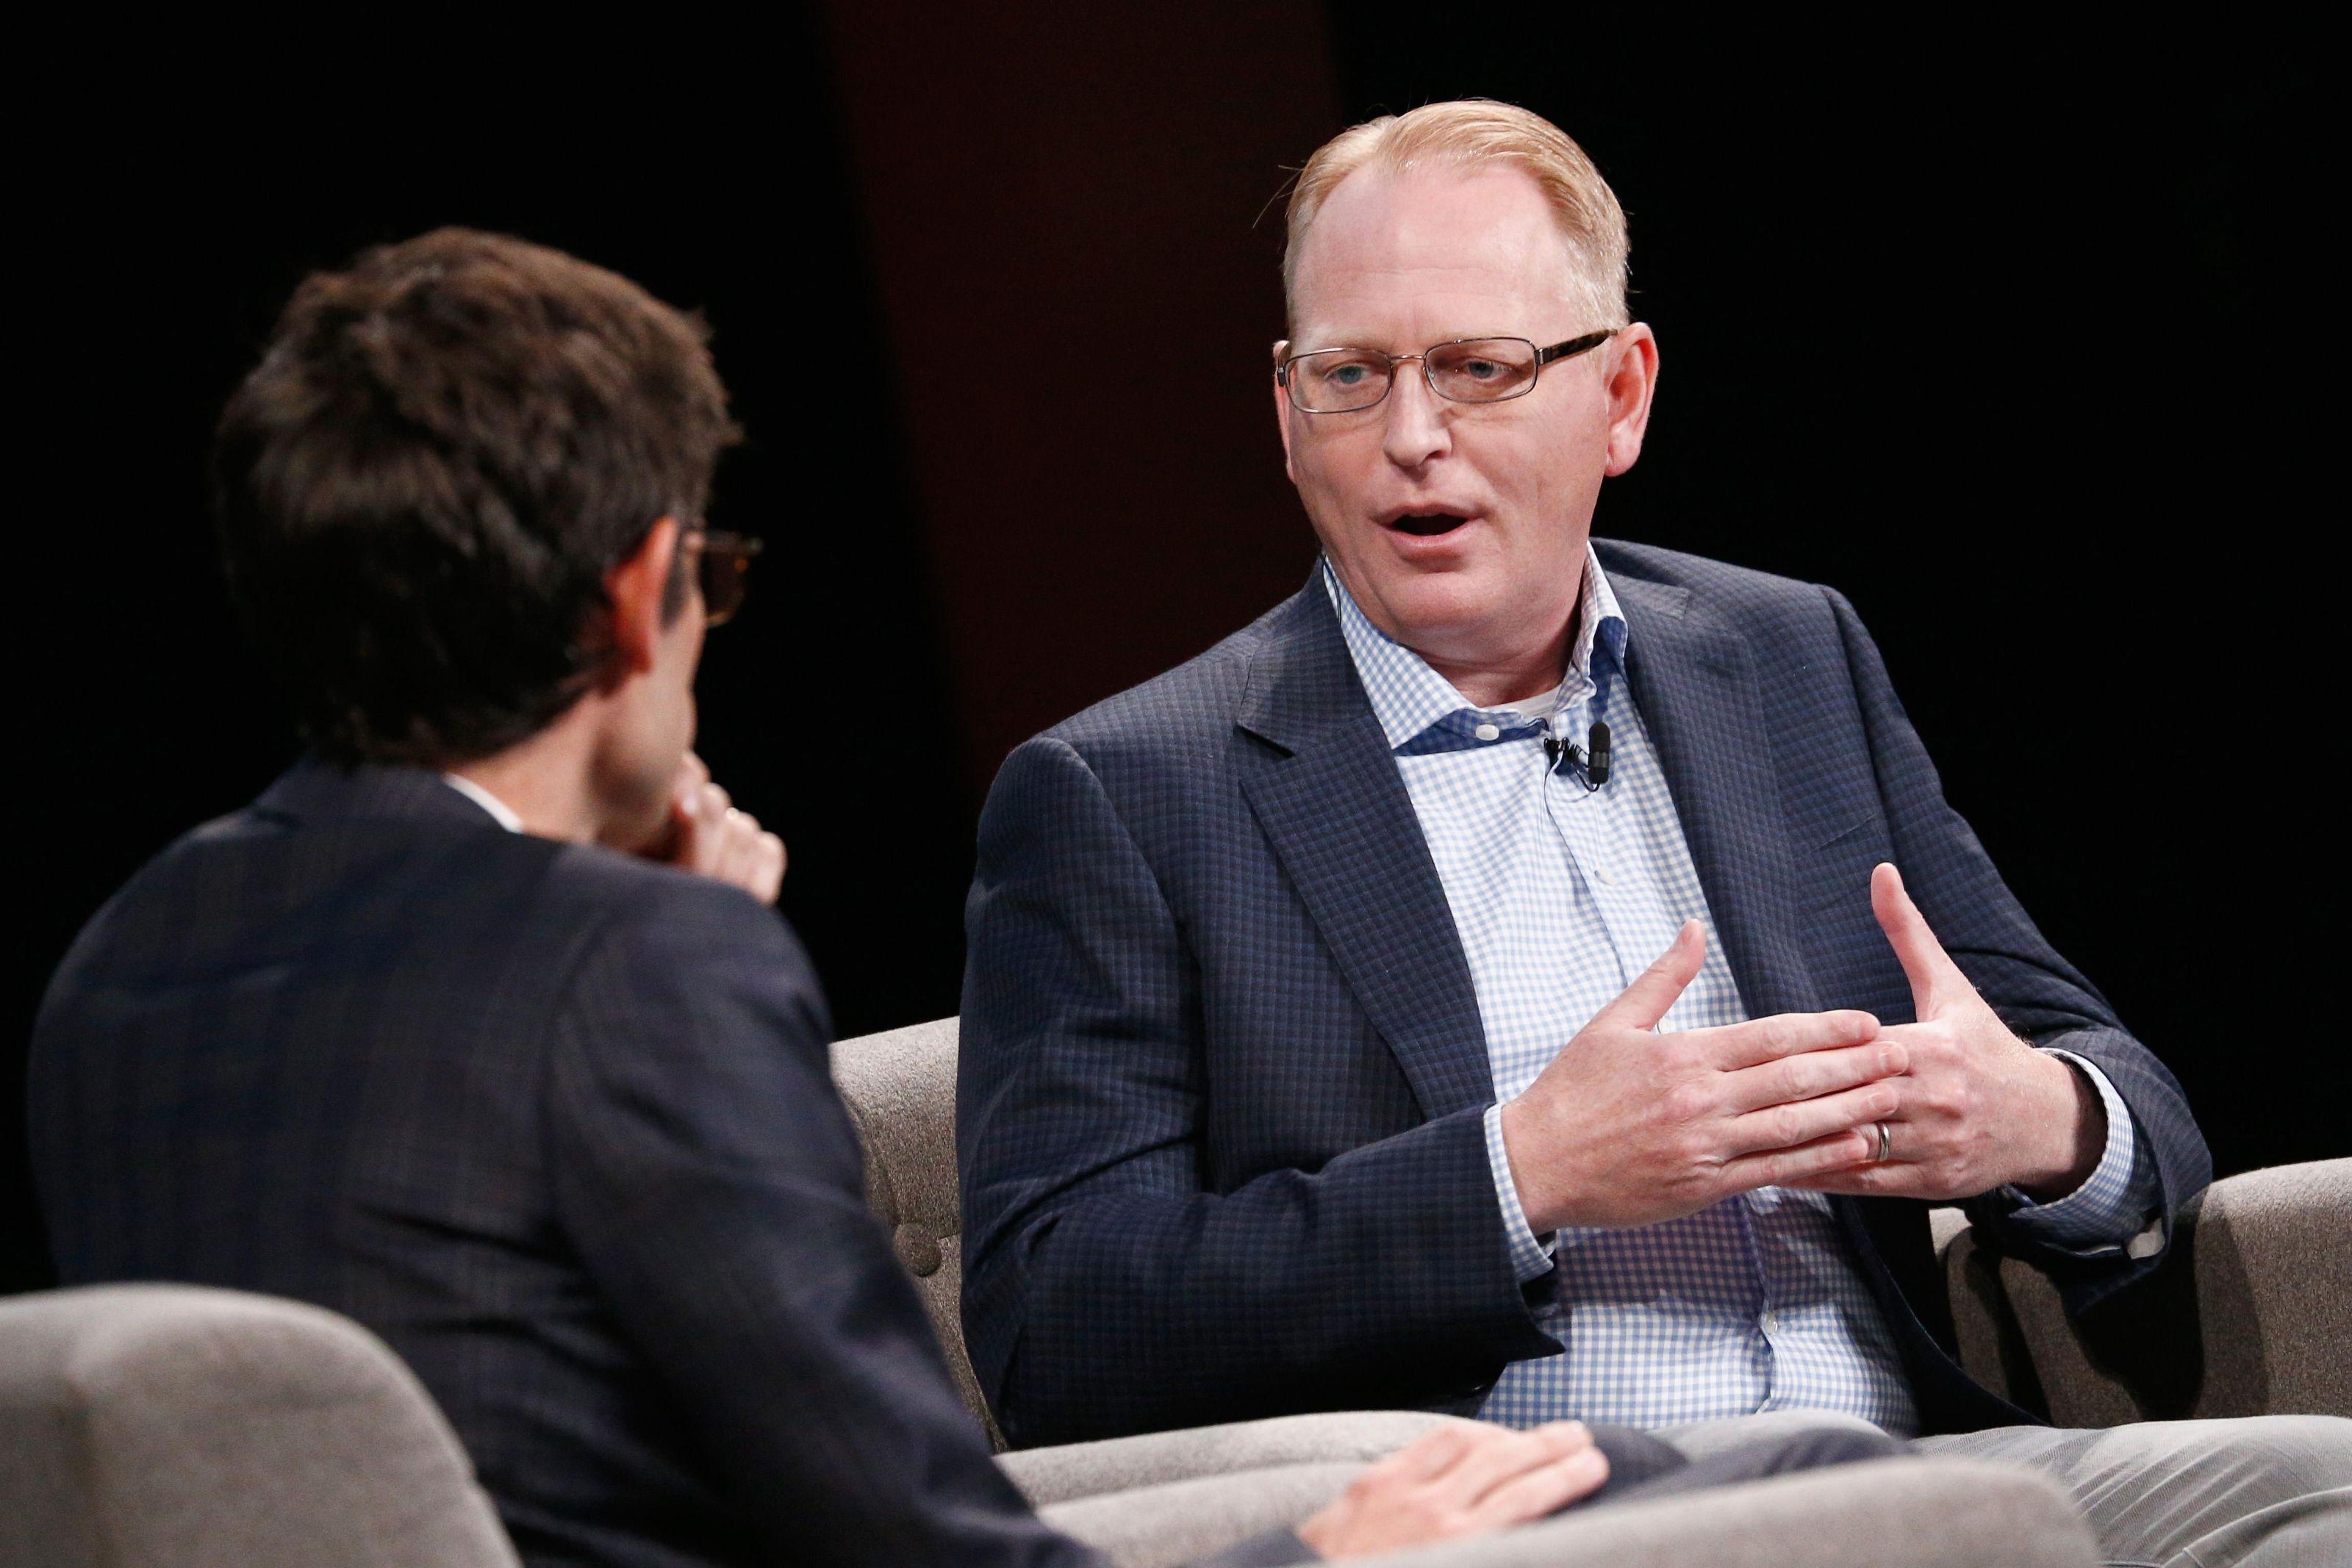 David Limp, da Amazon, na Conferência de Negócios da WIRED